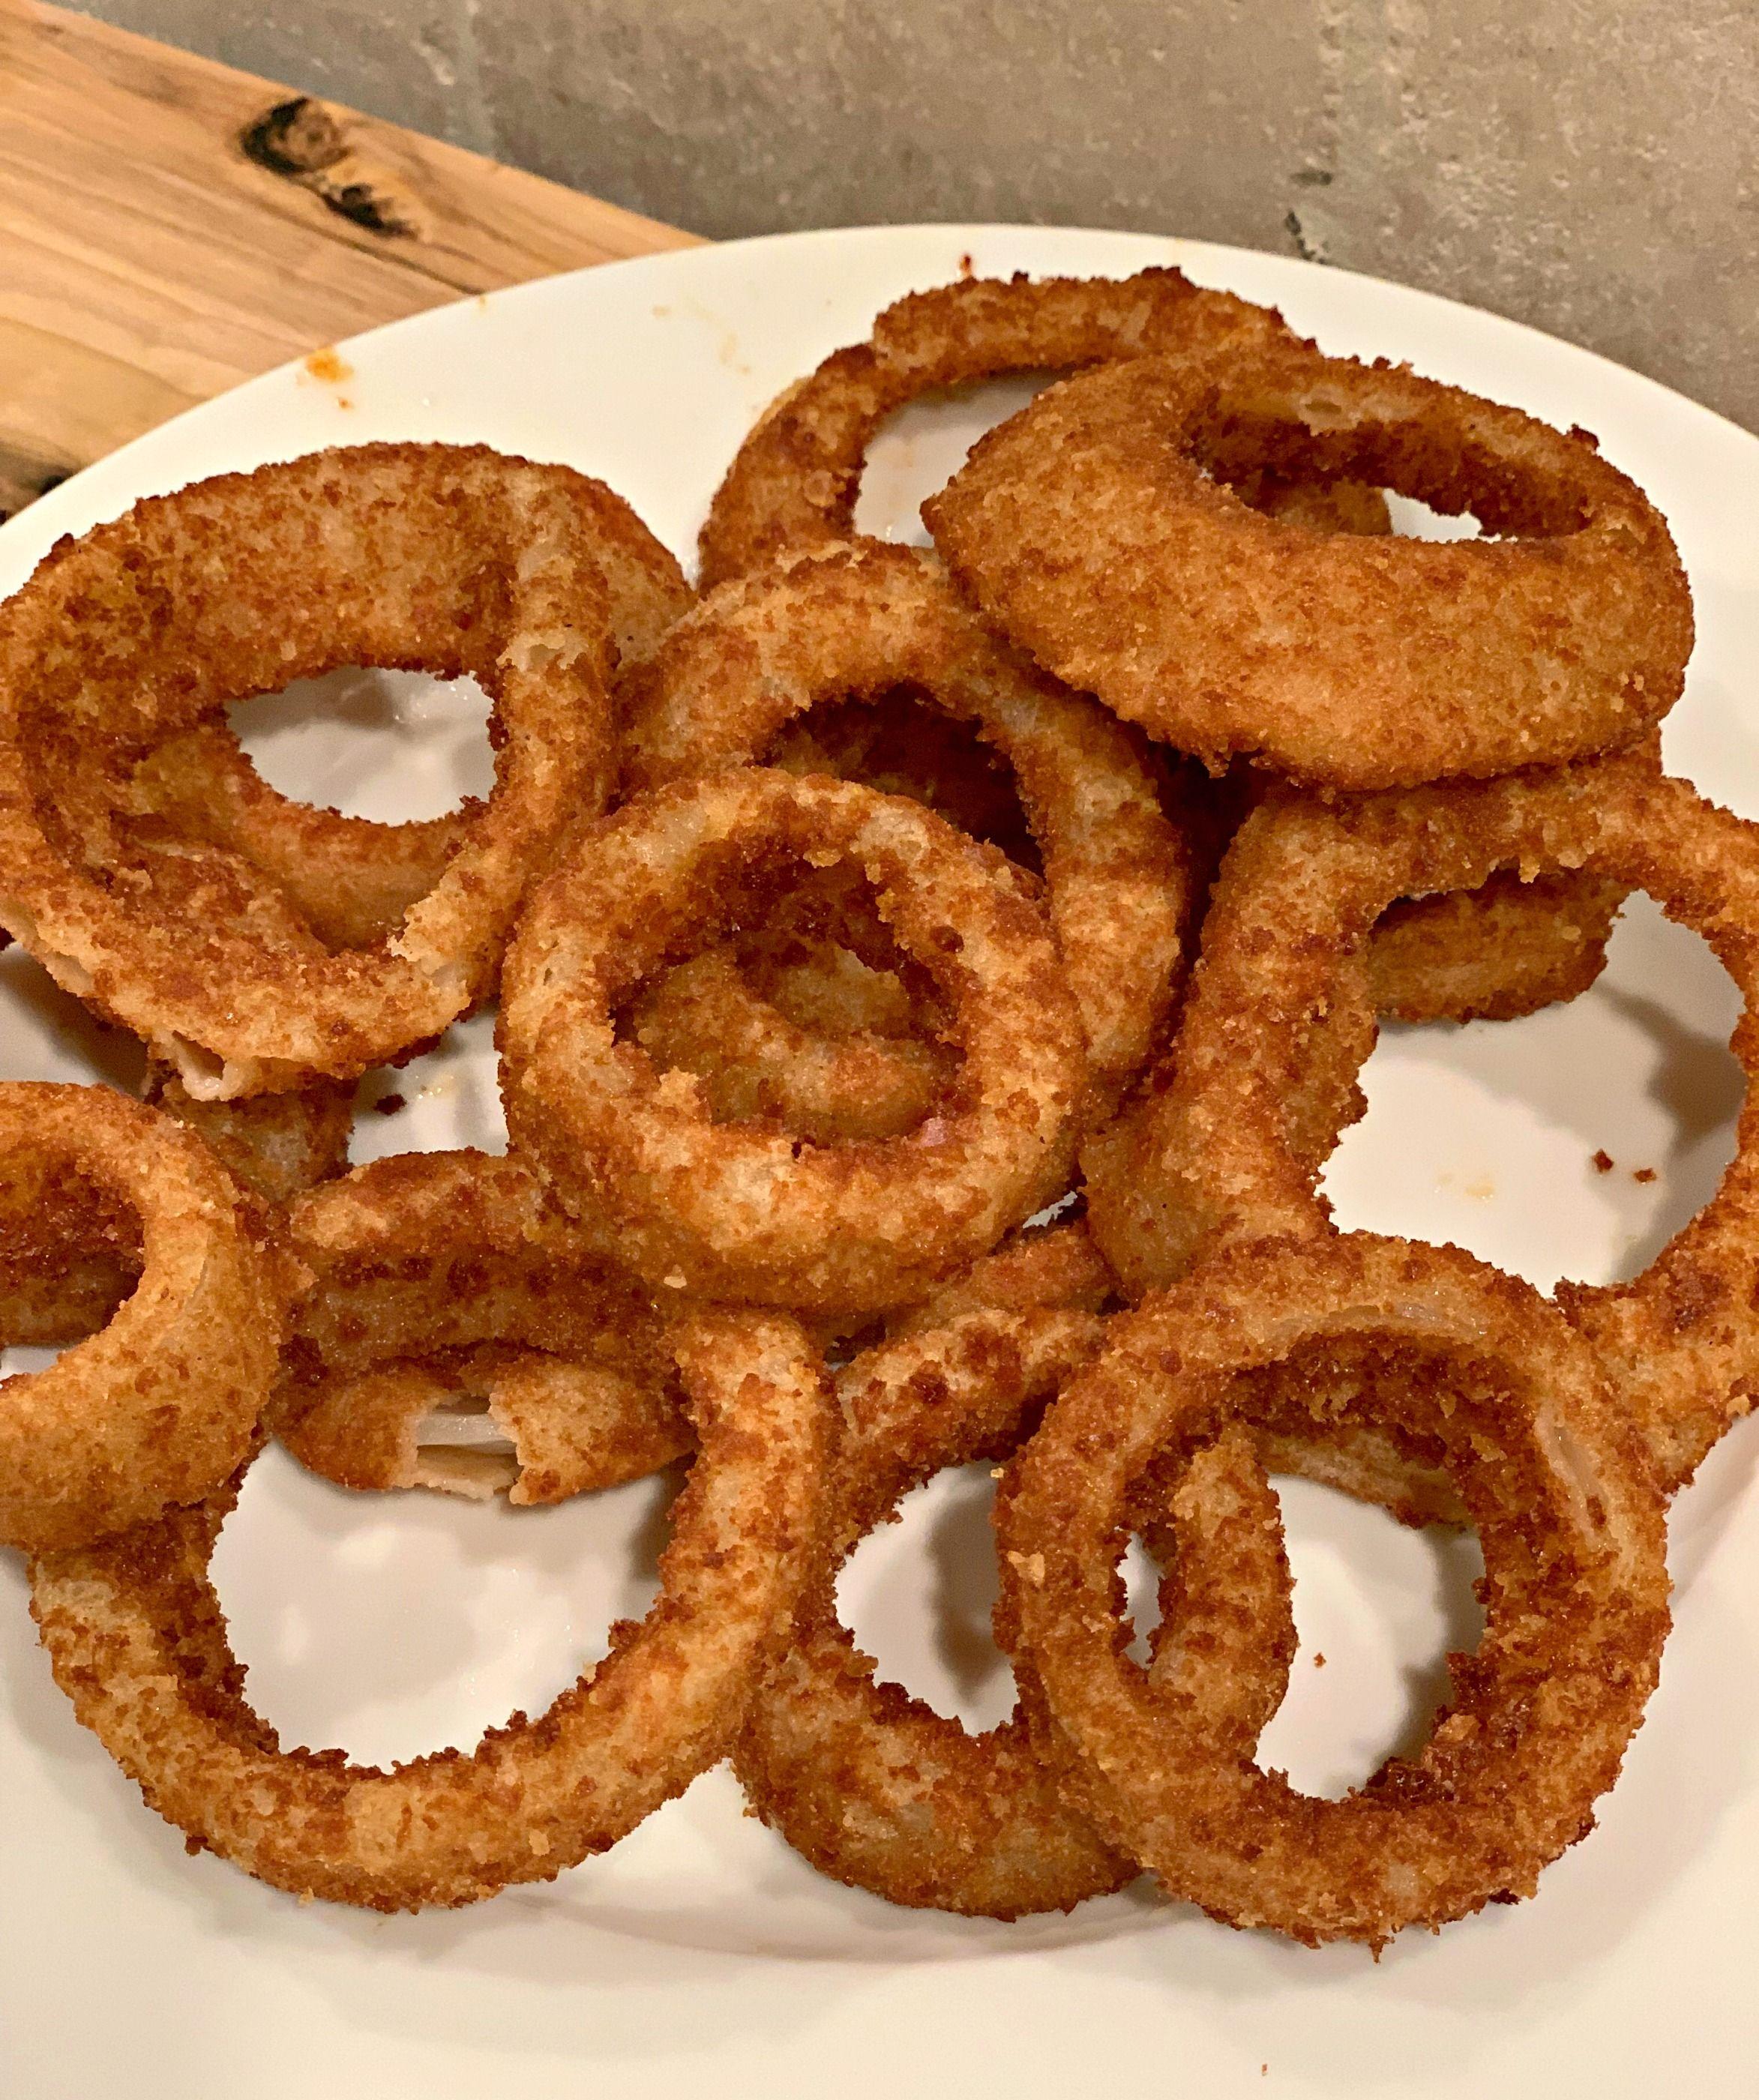 Crispy Air Fried Onion Rings Recipe Air frier recipes